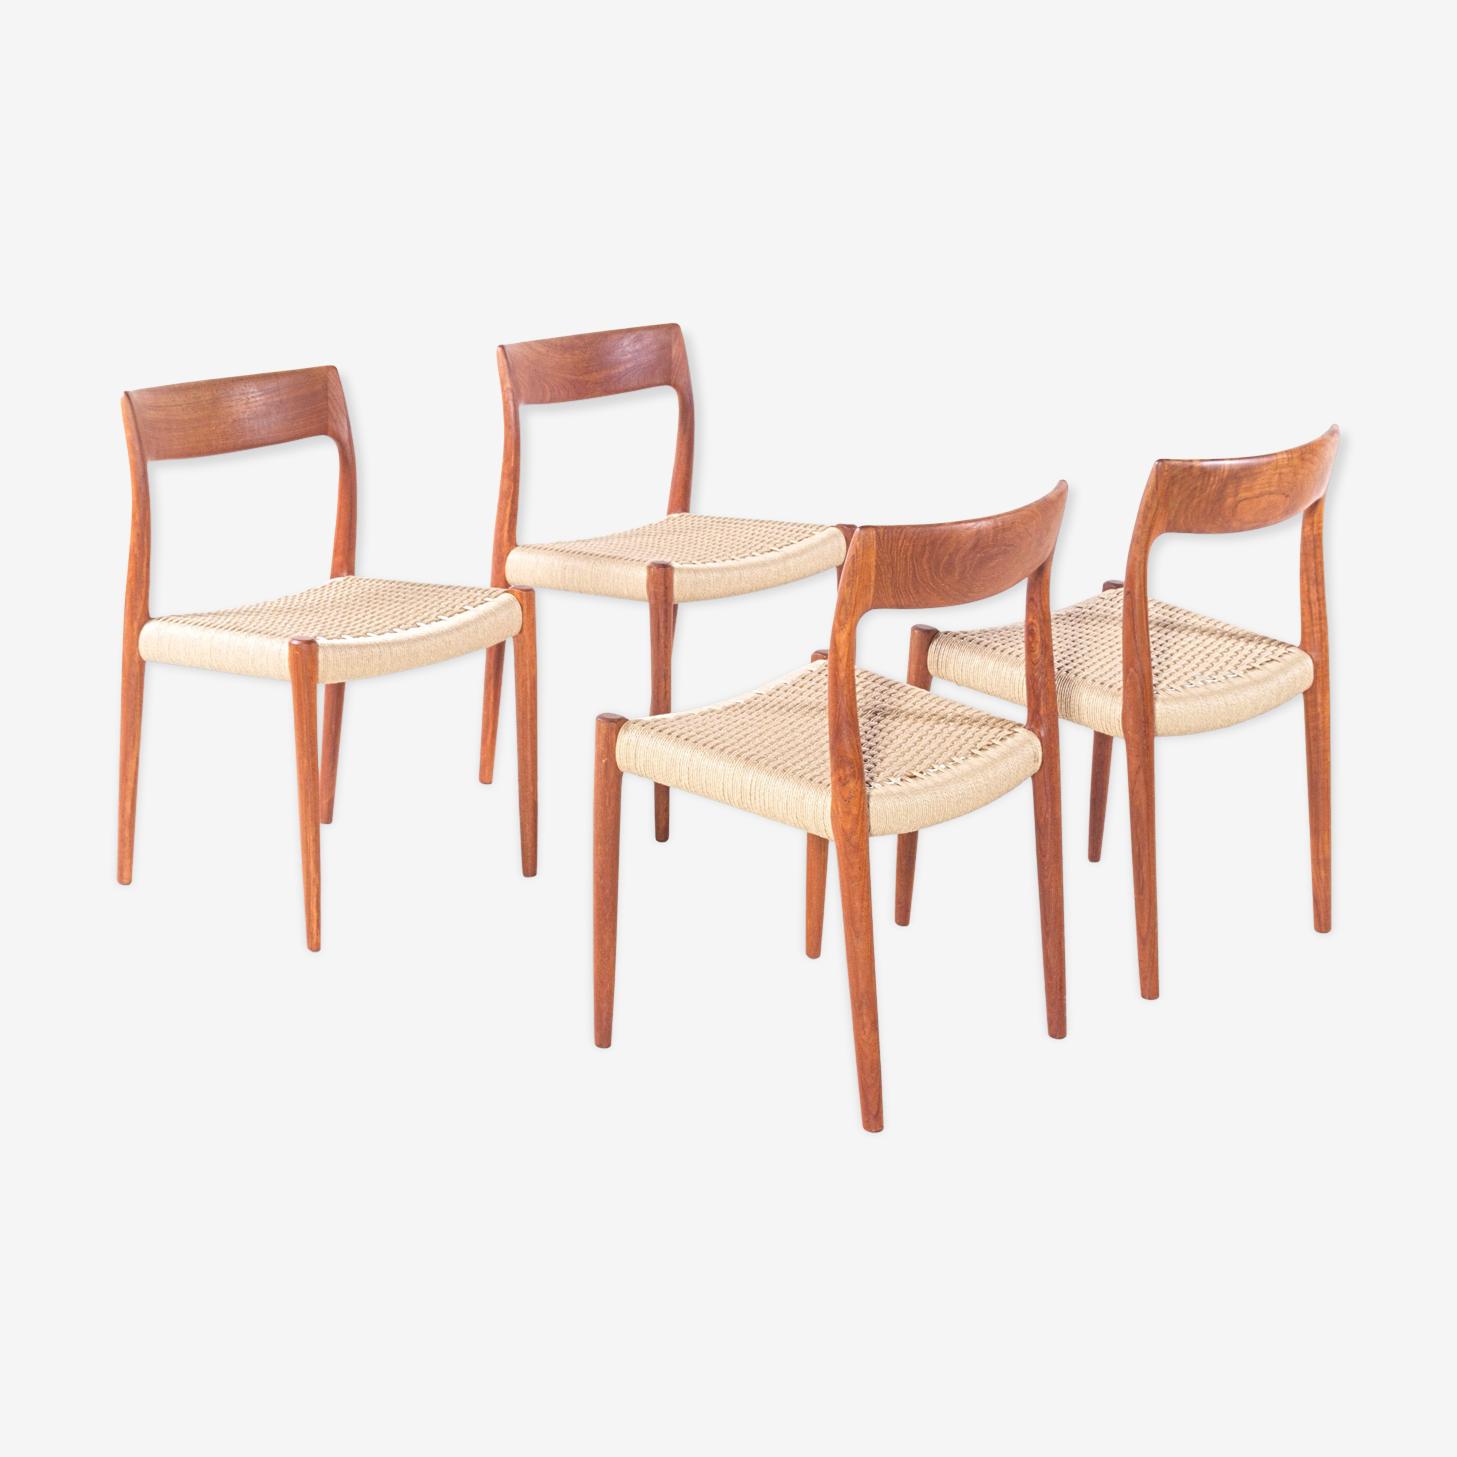 Set of four chairs model 77 by Niels Otto Møller Denmark